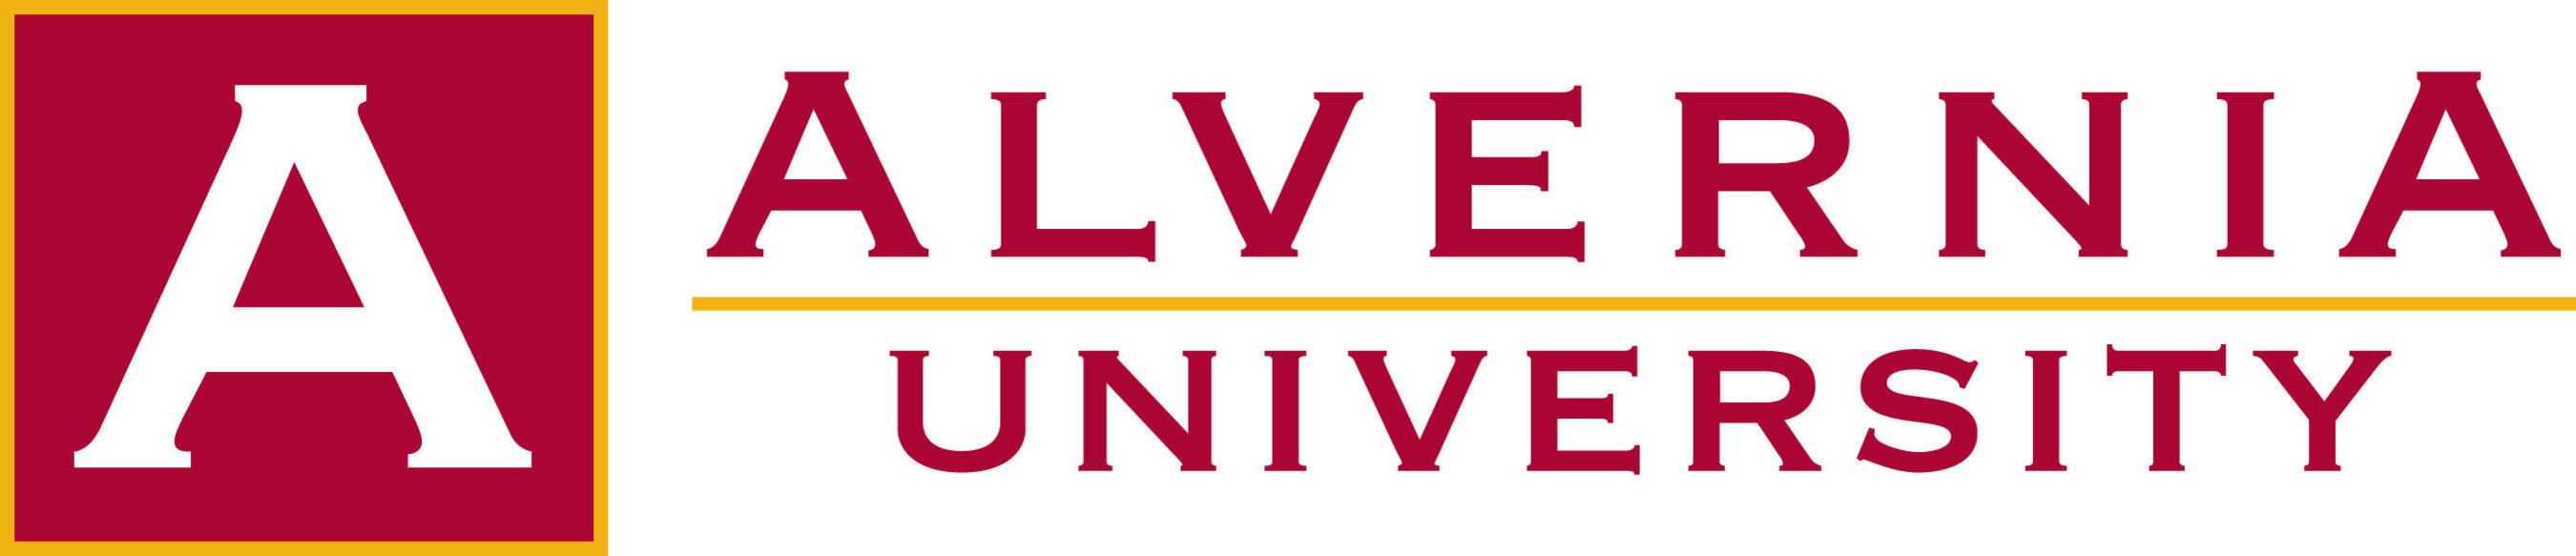 The Official Logo of Alvernia University, Reading, Pa.